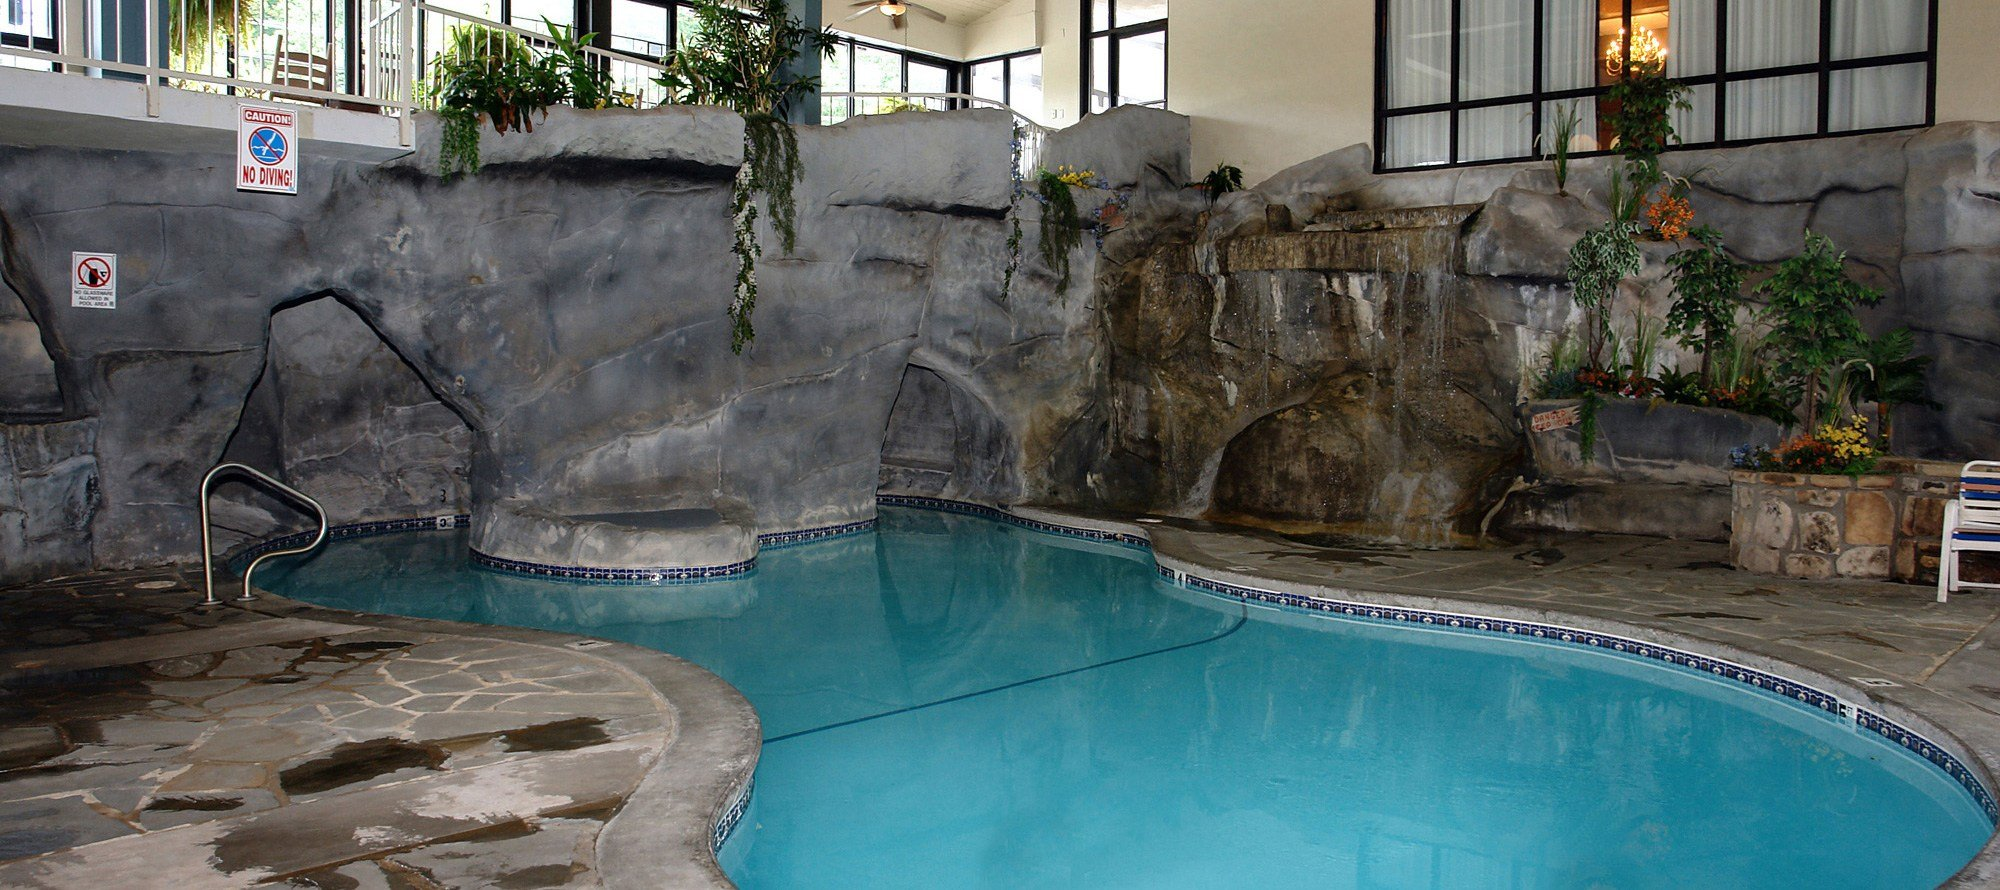 Sidney James Mountain Lodge image 1